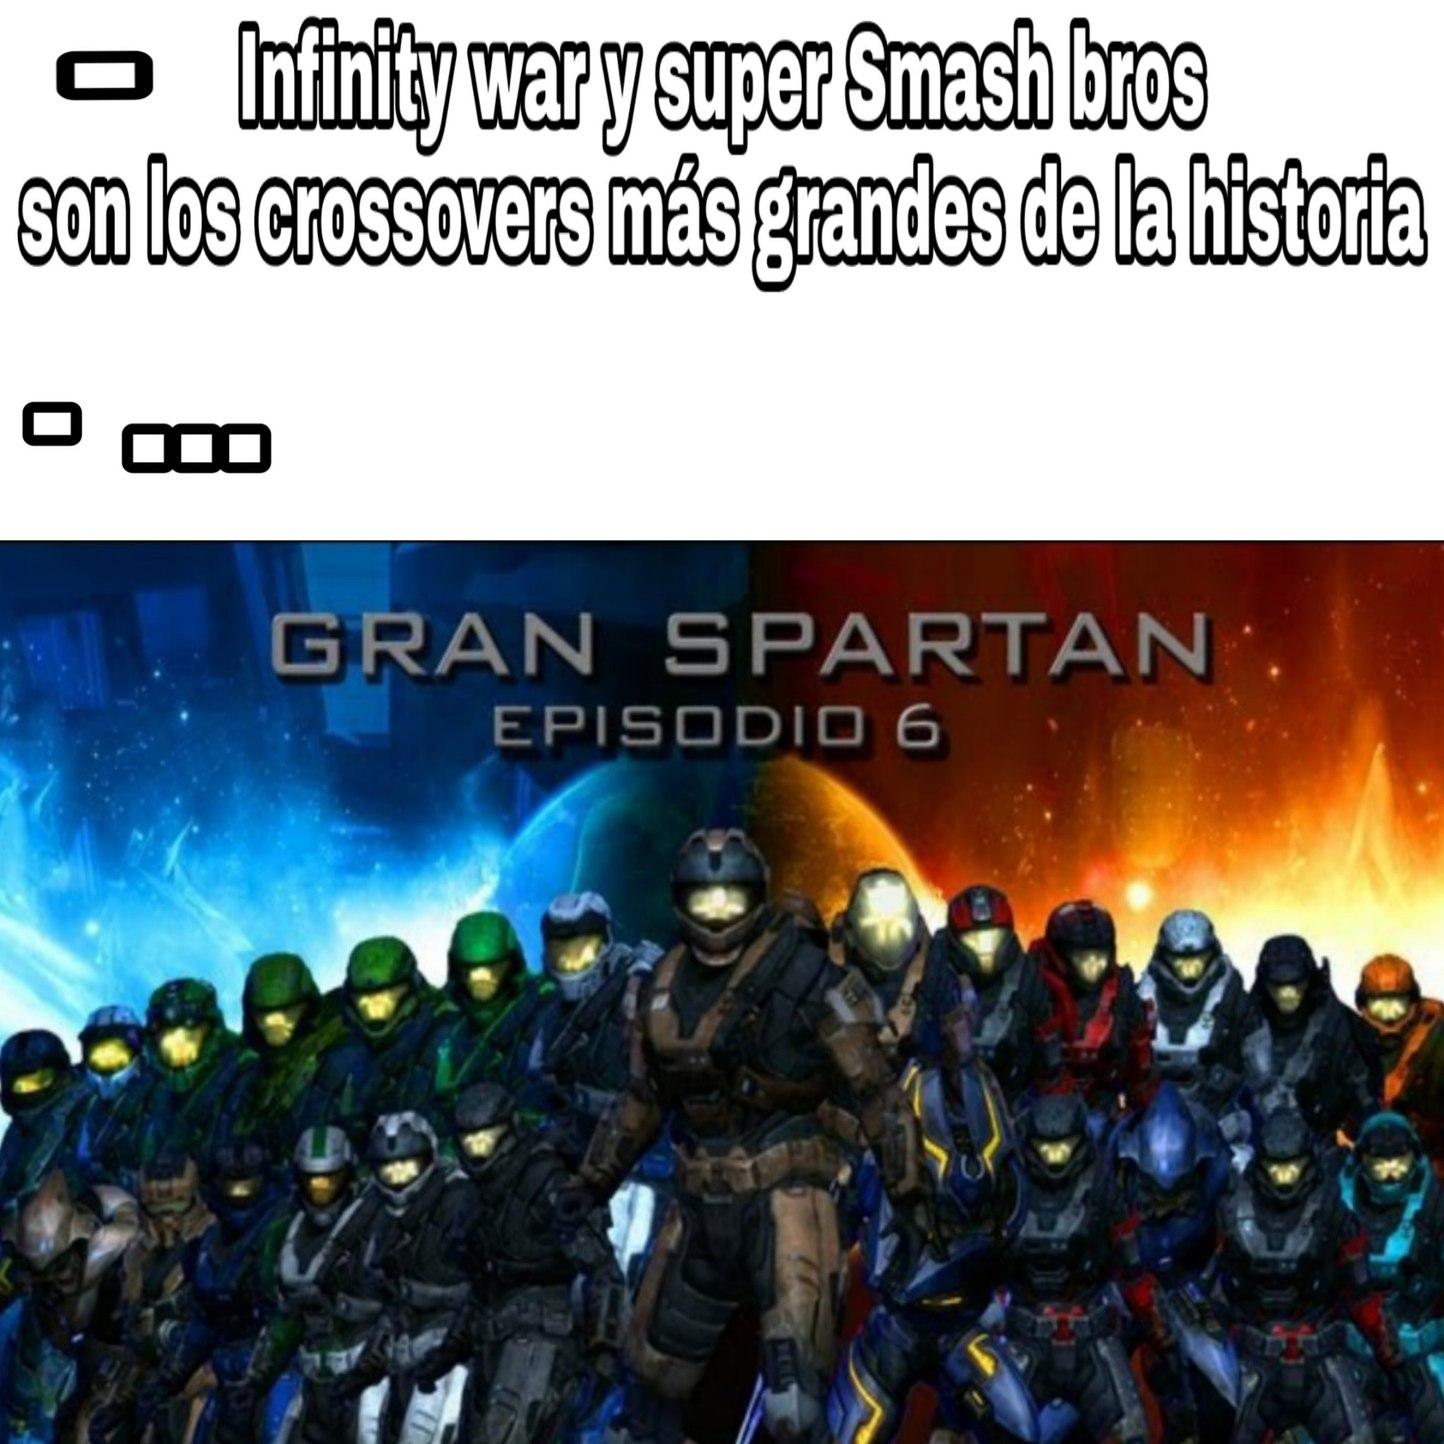 Pero que buen Machinima crossover - meme